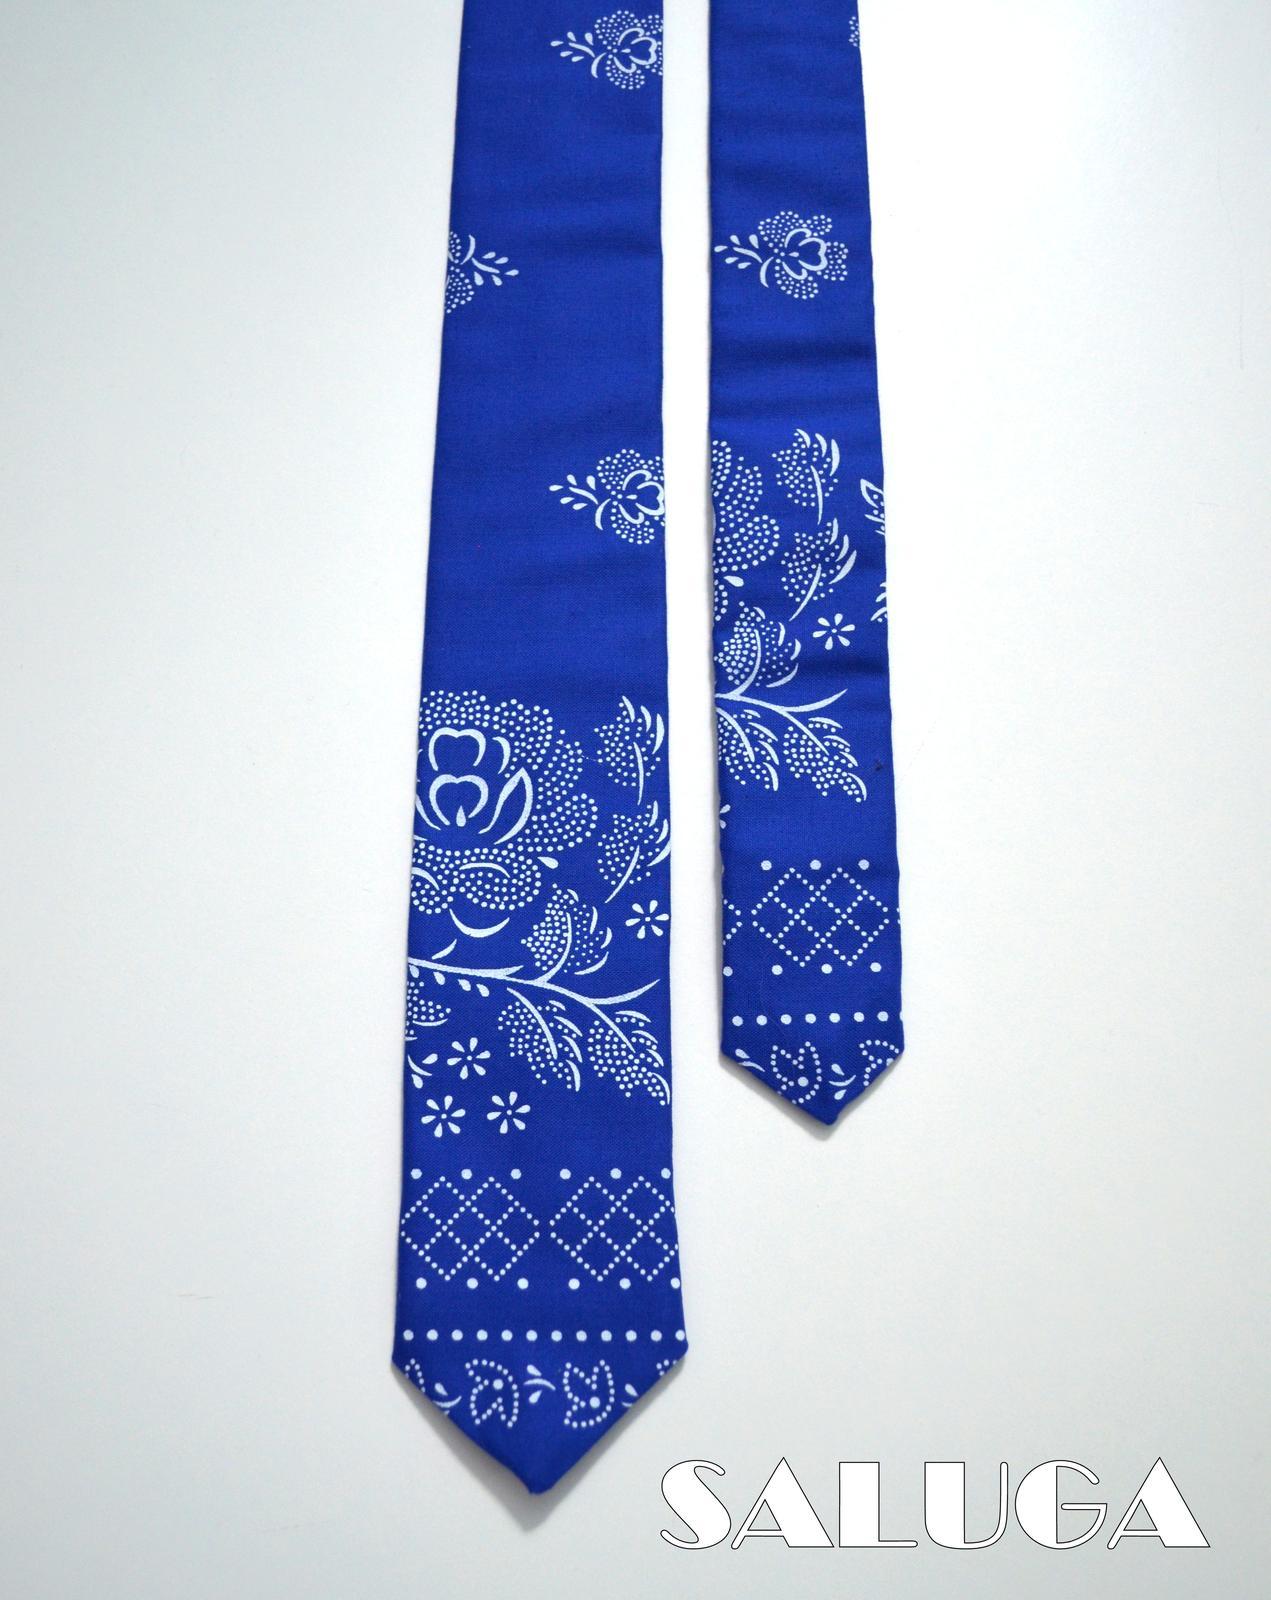 Pánska slim kravata - folklórna - modrá - Obrázok č. 2